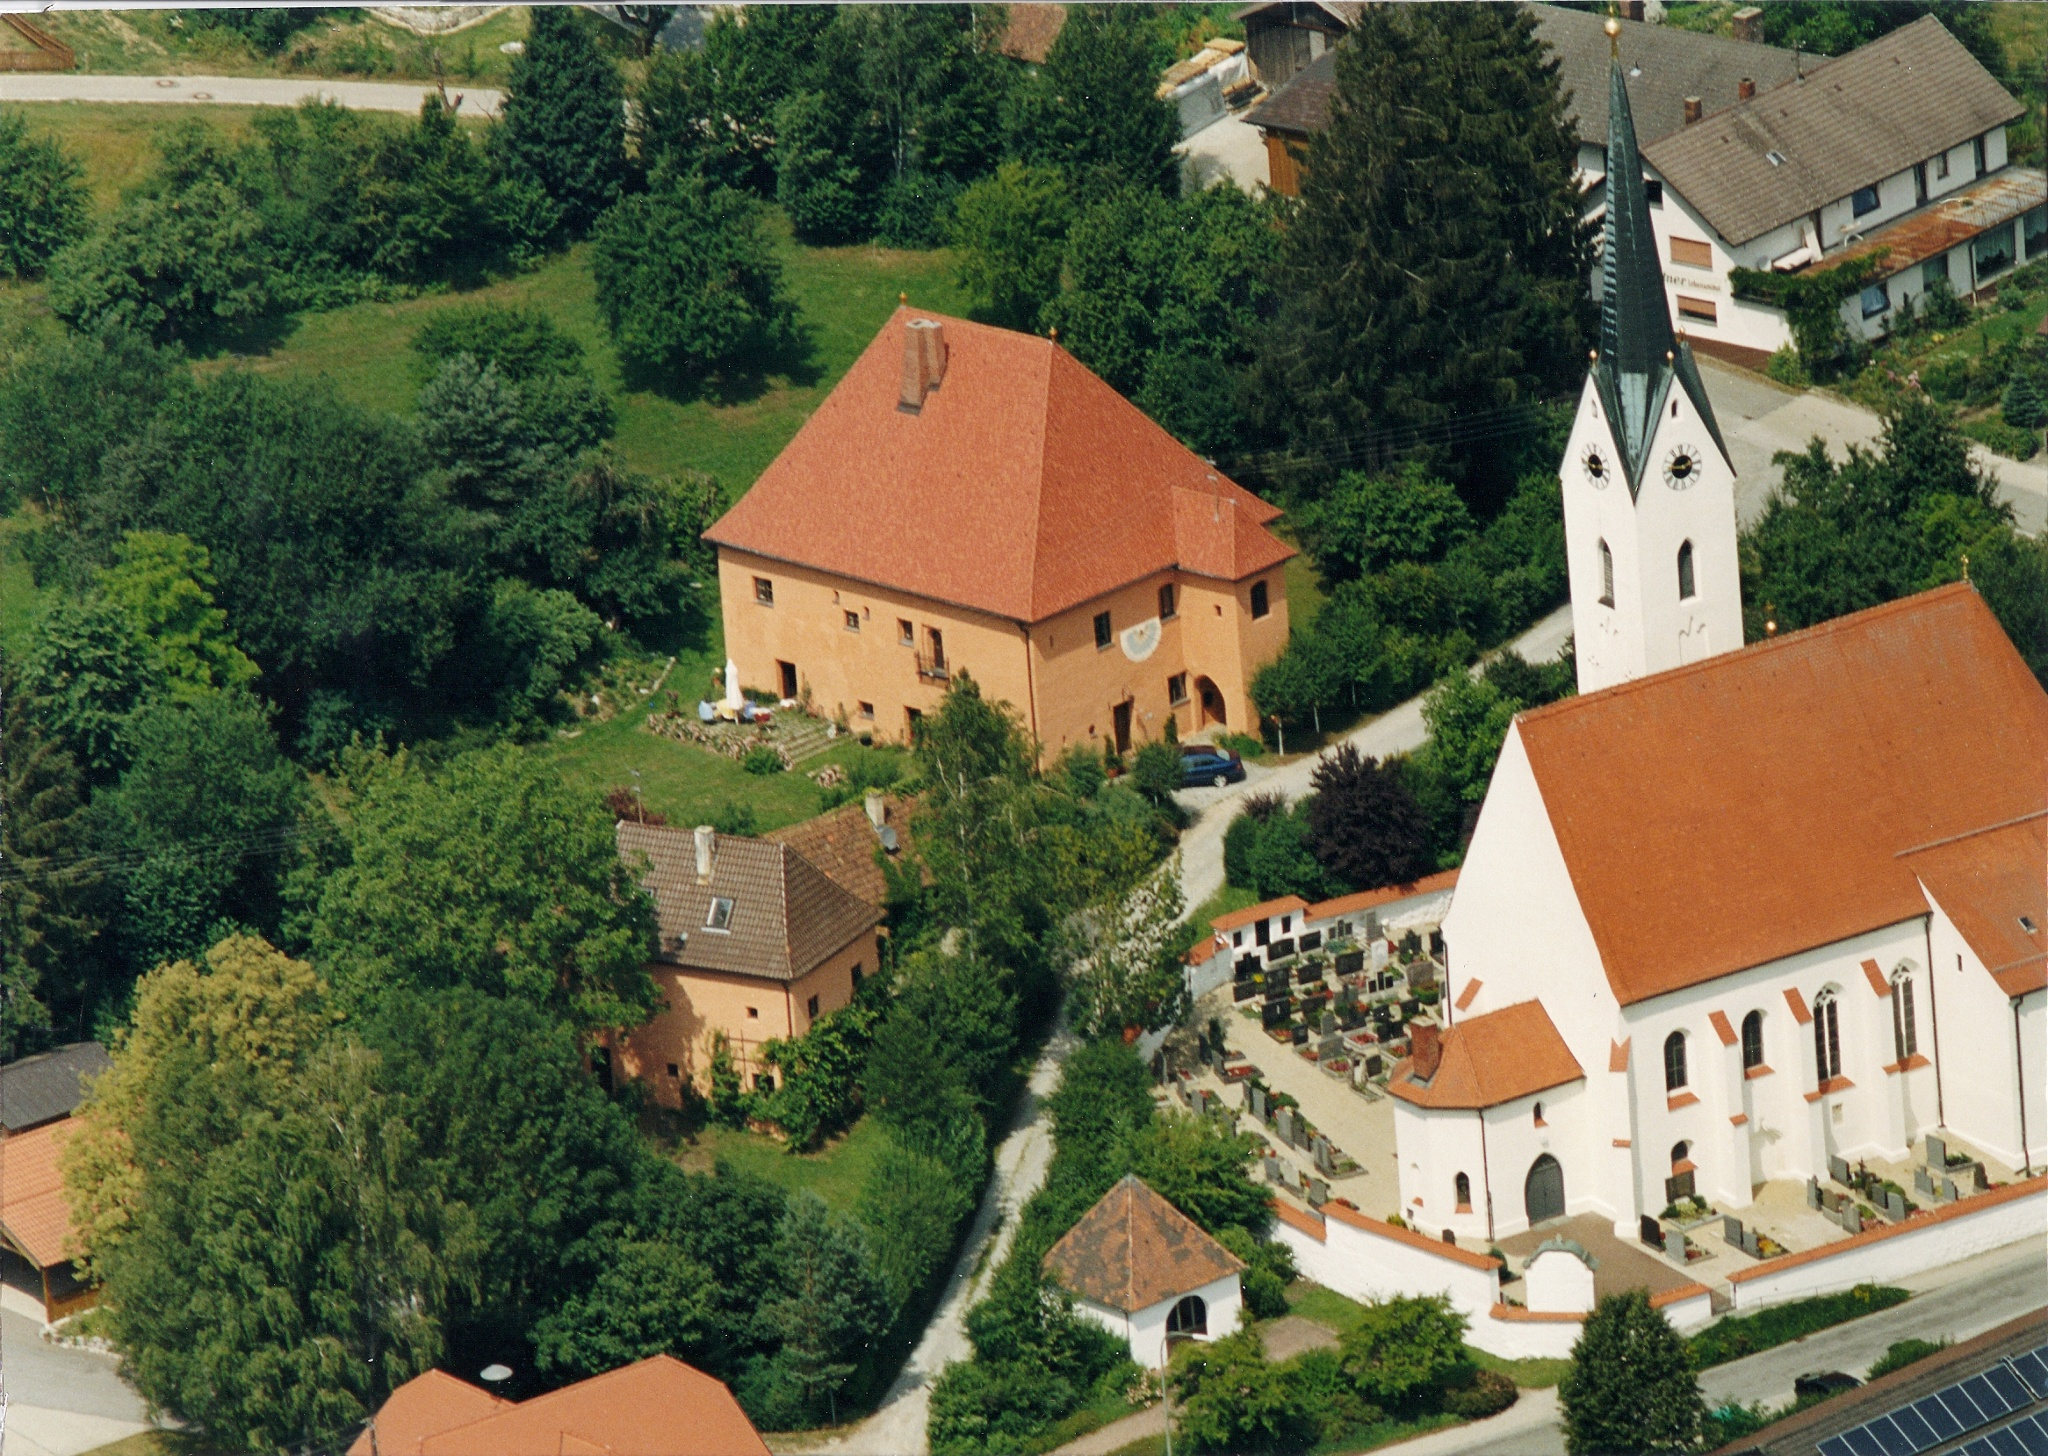 Peterskirchen